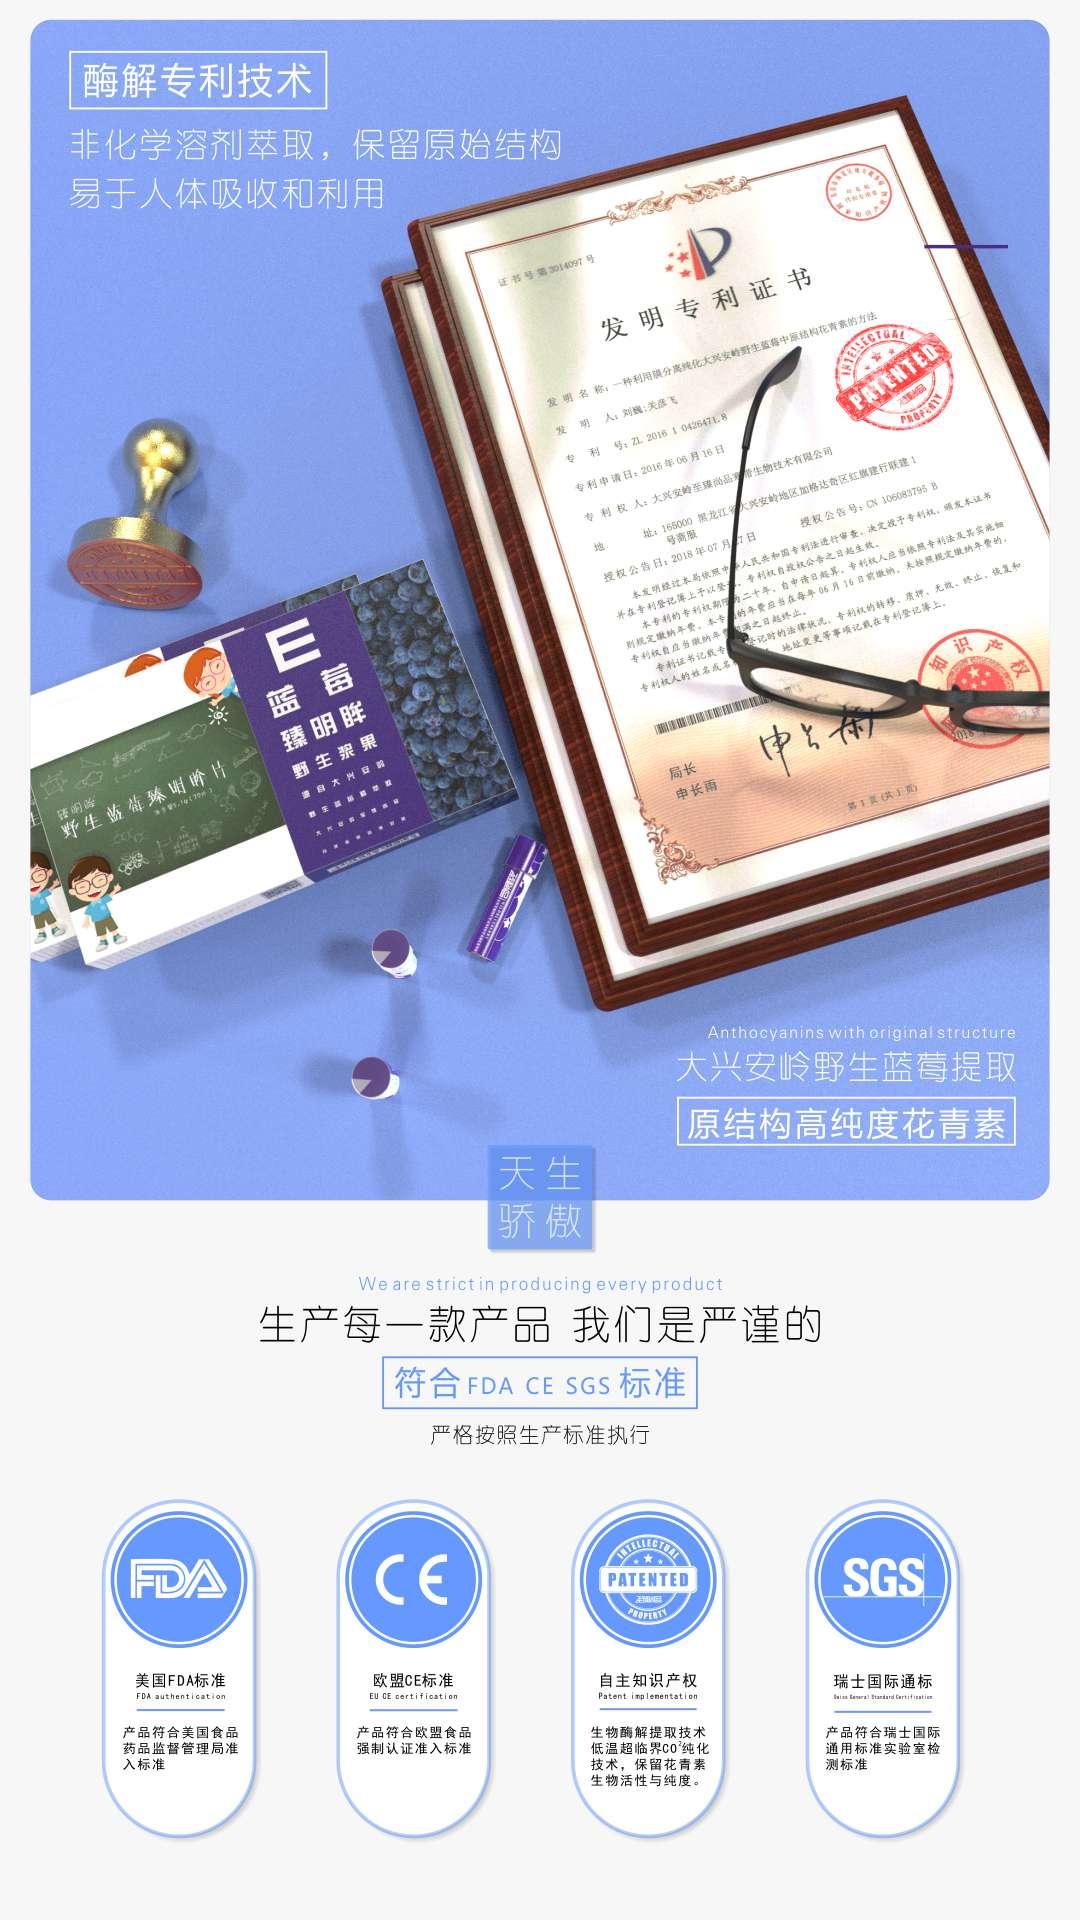 Z 至臻尚品-臻明眸藍莓花青素片-03.jpg